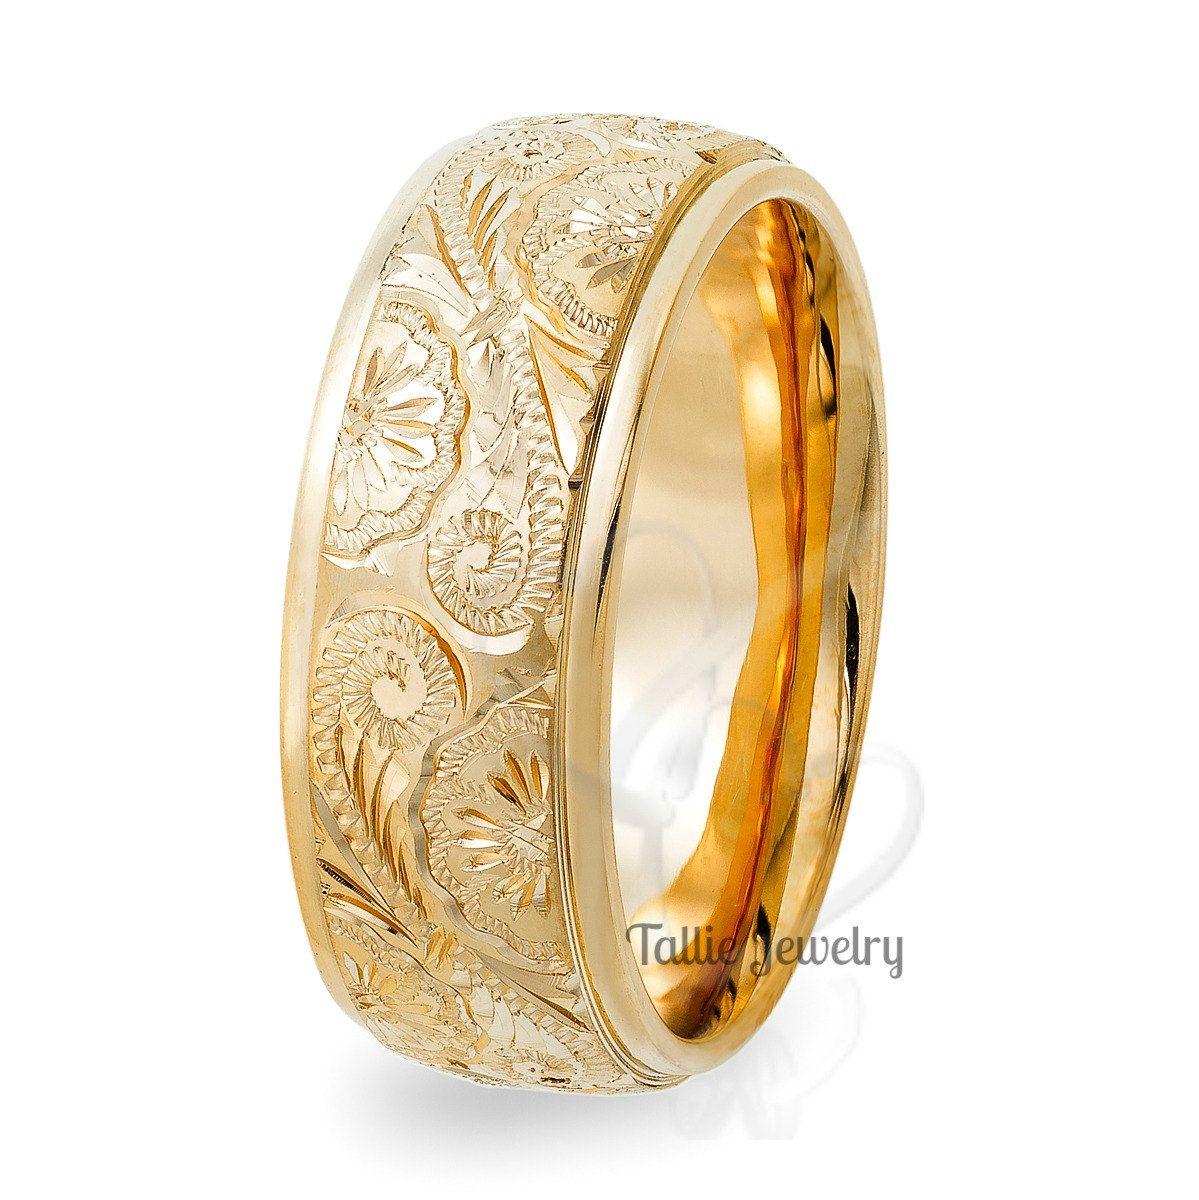 Hand Engraved Mens Wedding Rings 8mm 10k 14k Yellow Gold Wedding Bands Matchin Mens Yellow Gold Wedding Bands Mens Gold Wedding Band Hand Engraved Wedding Band